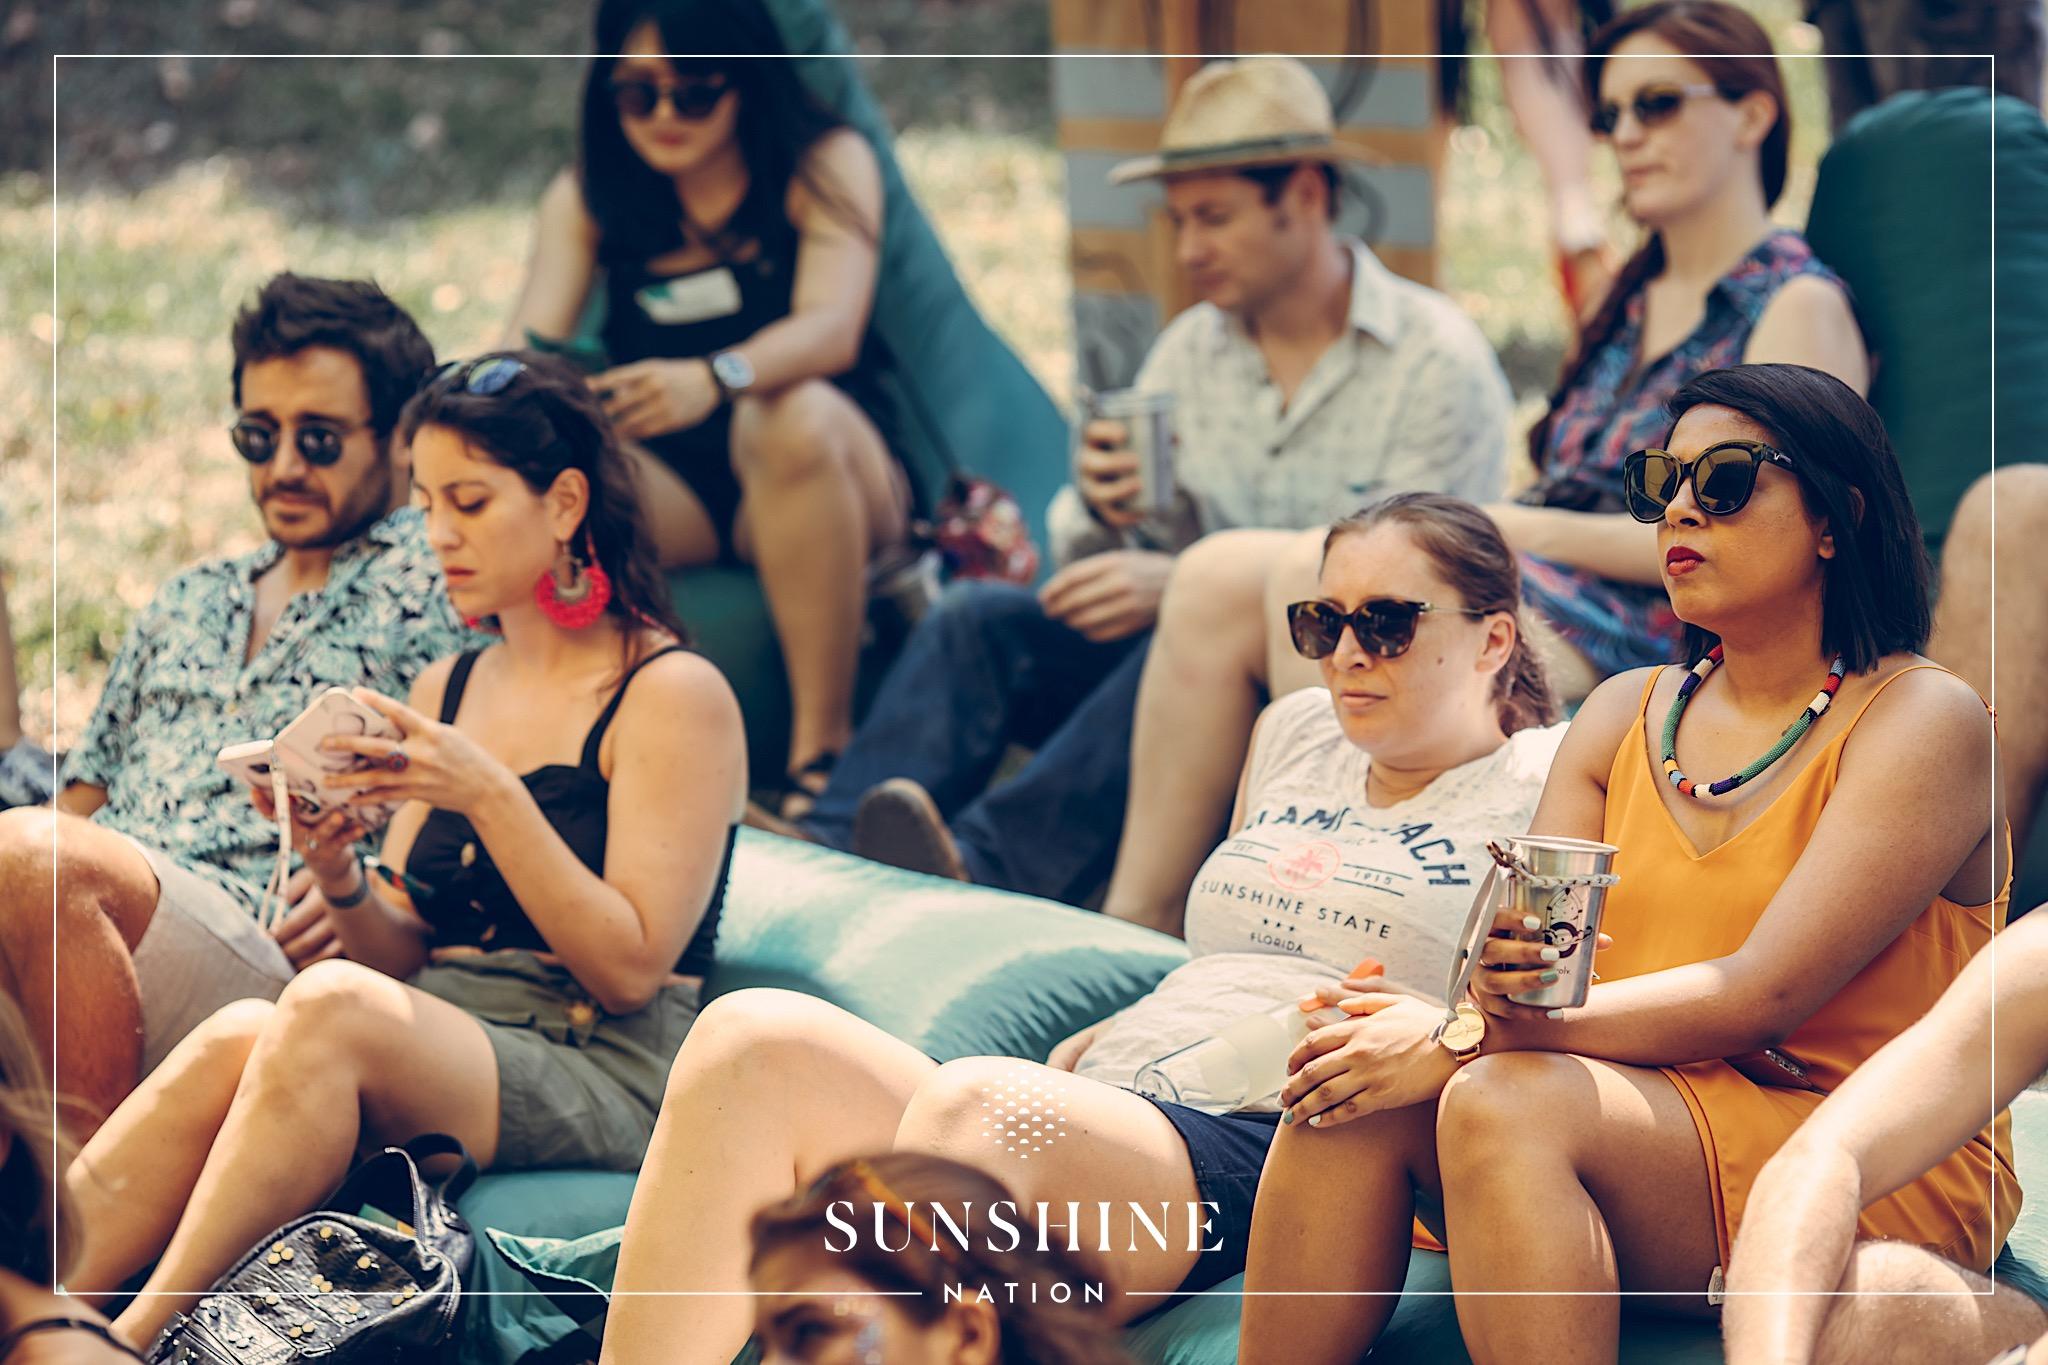 09032019_SunshineNation_Colossal102_Watermarked.jpg